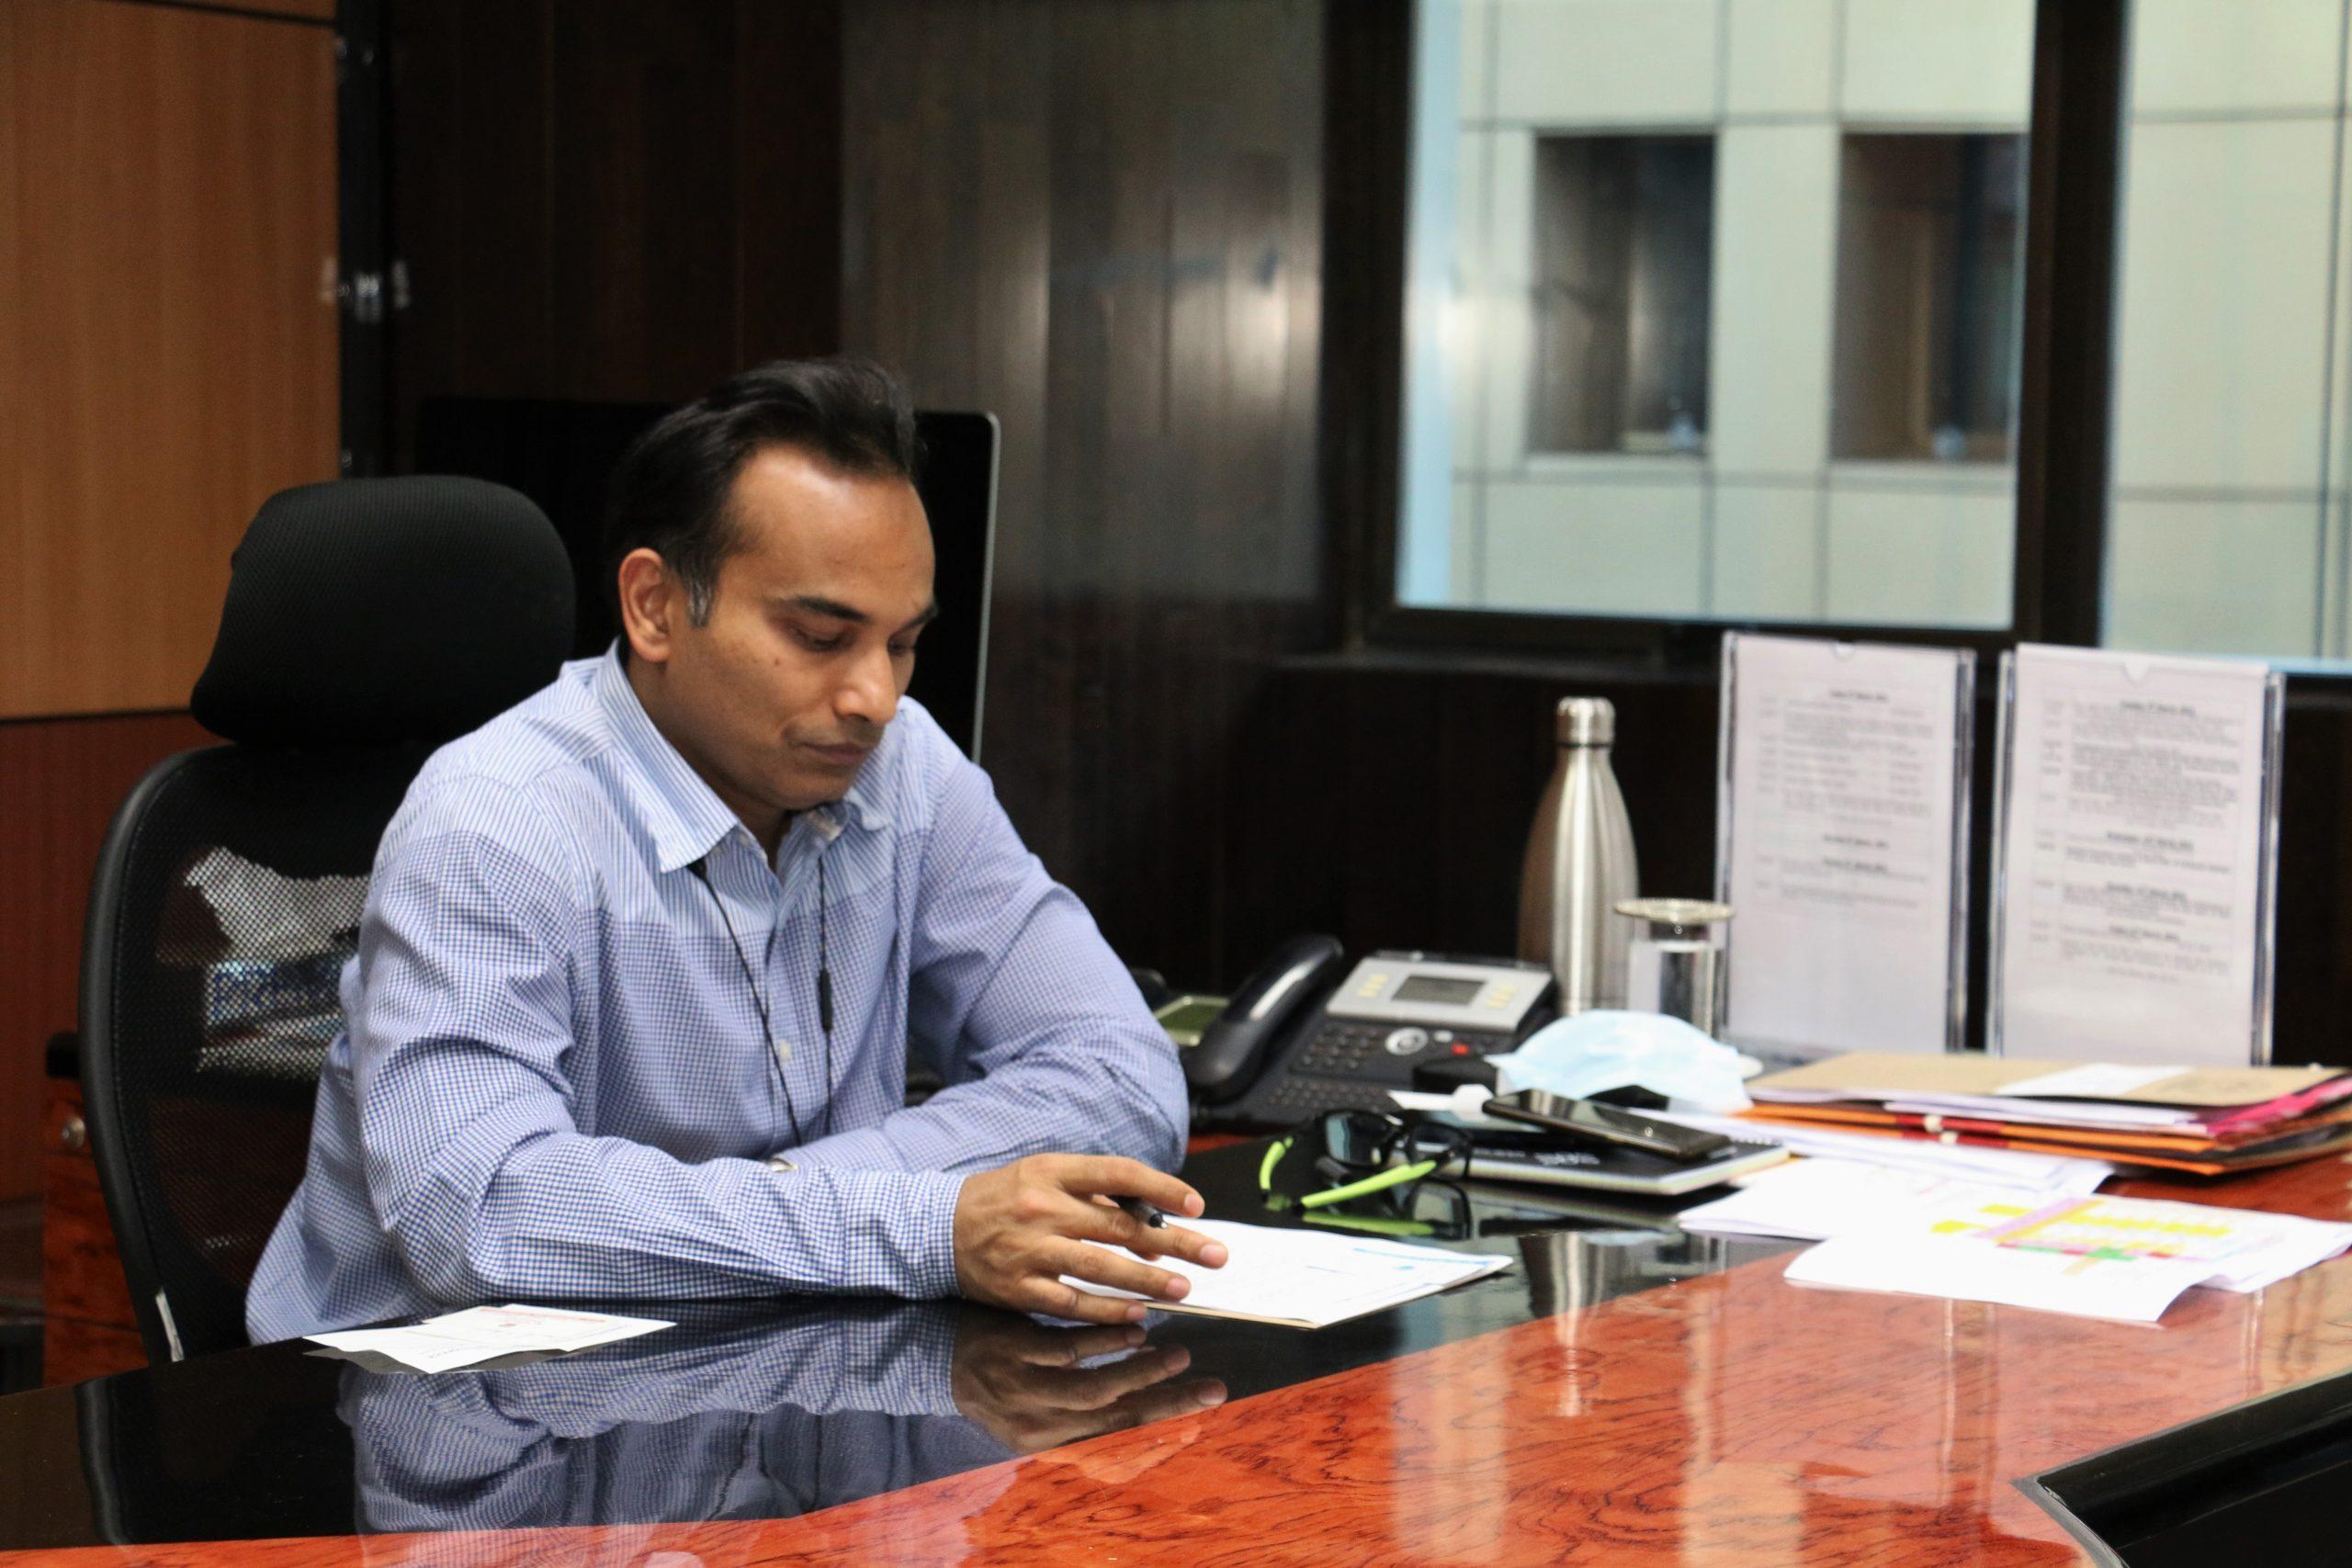 North MCD: नवनियुत आयुक्त संजय गोयल ने कार्यभार संभाला